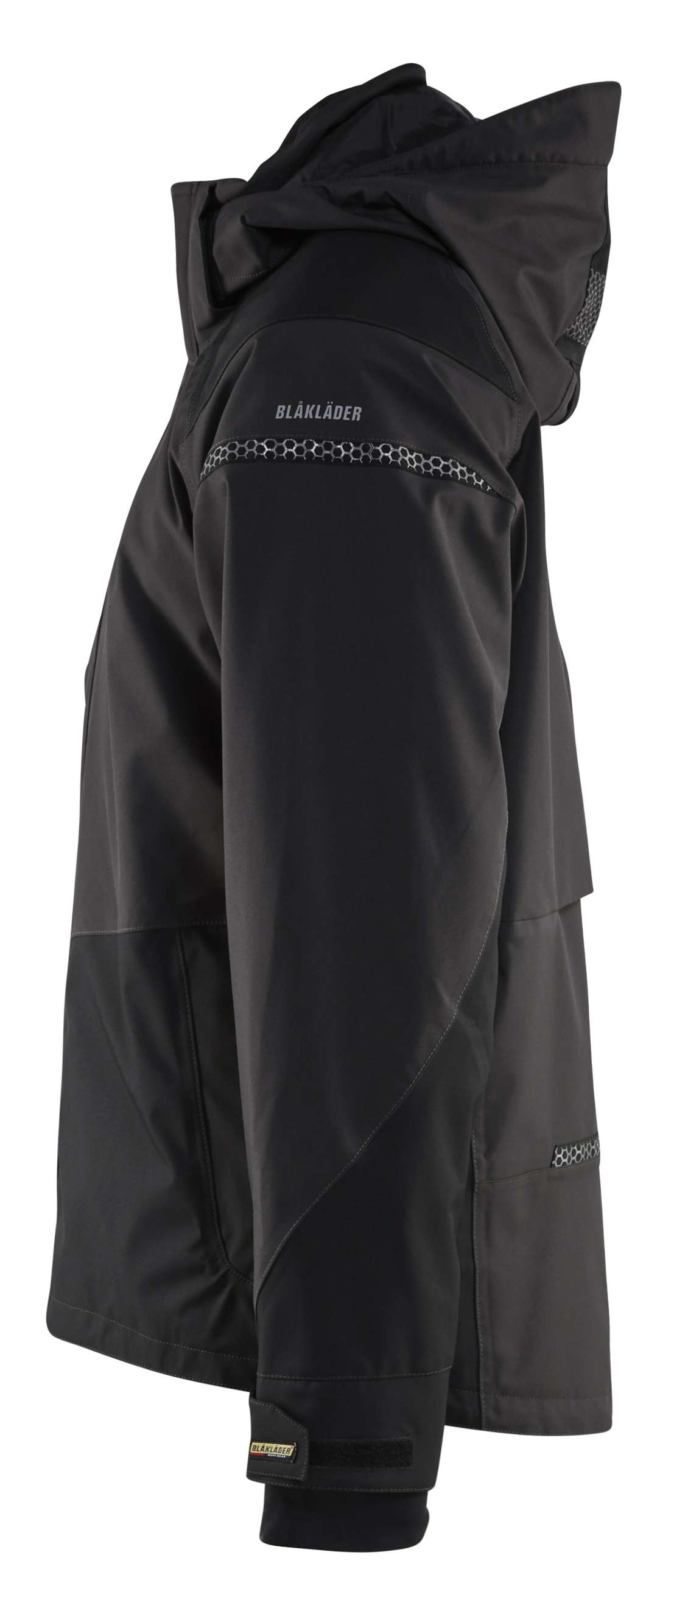 Blaklader Regenjacks 49881987 Stretch donkergrijs-zwart(9899)